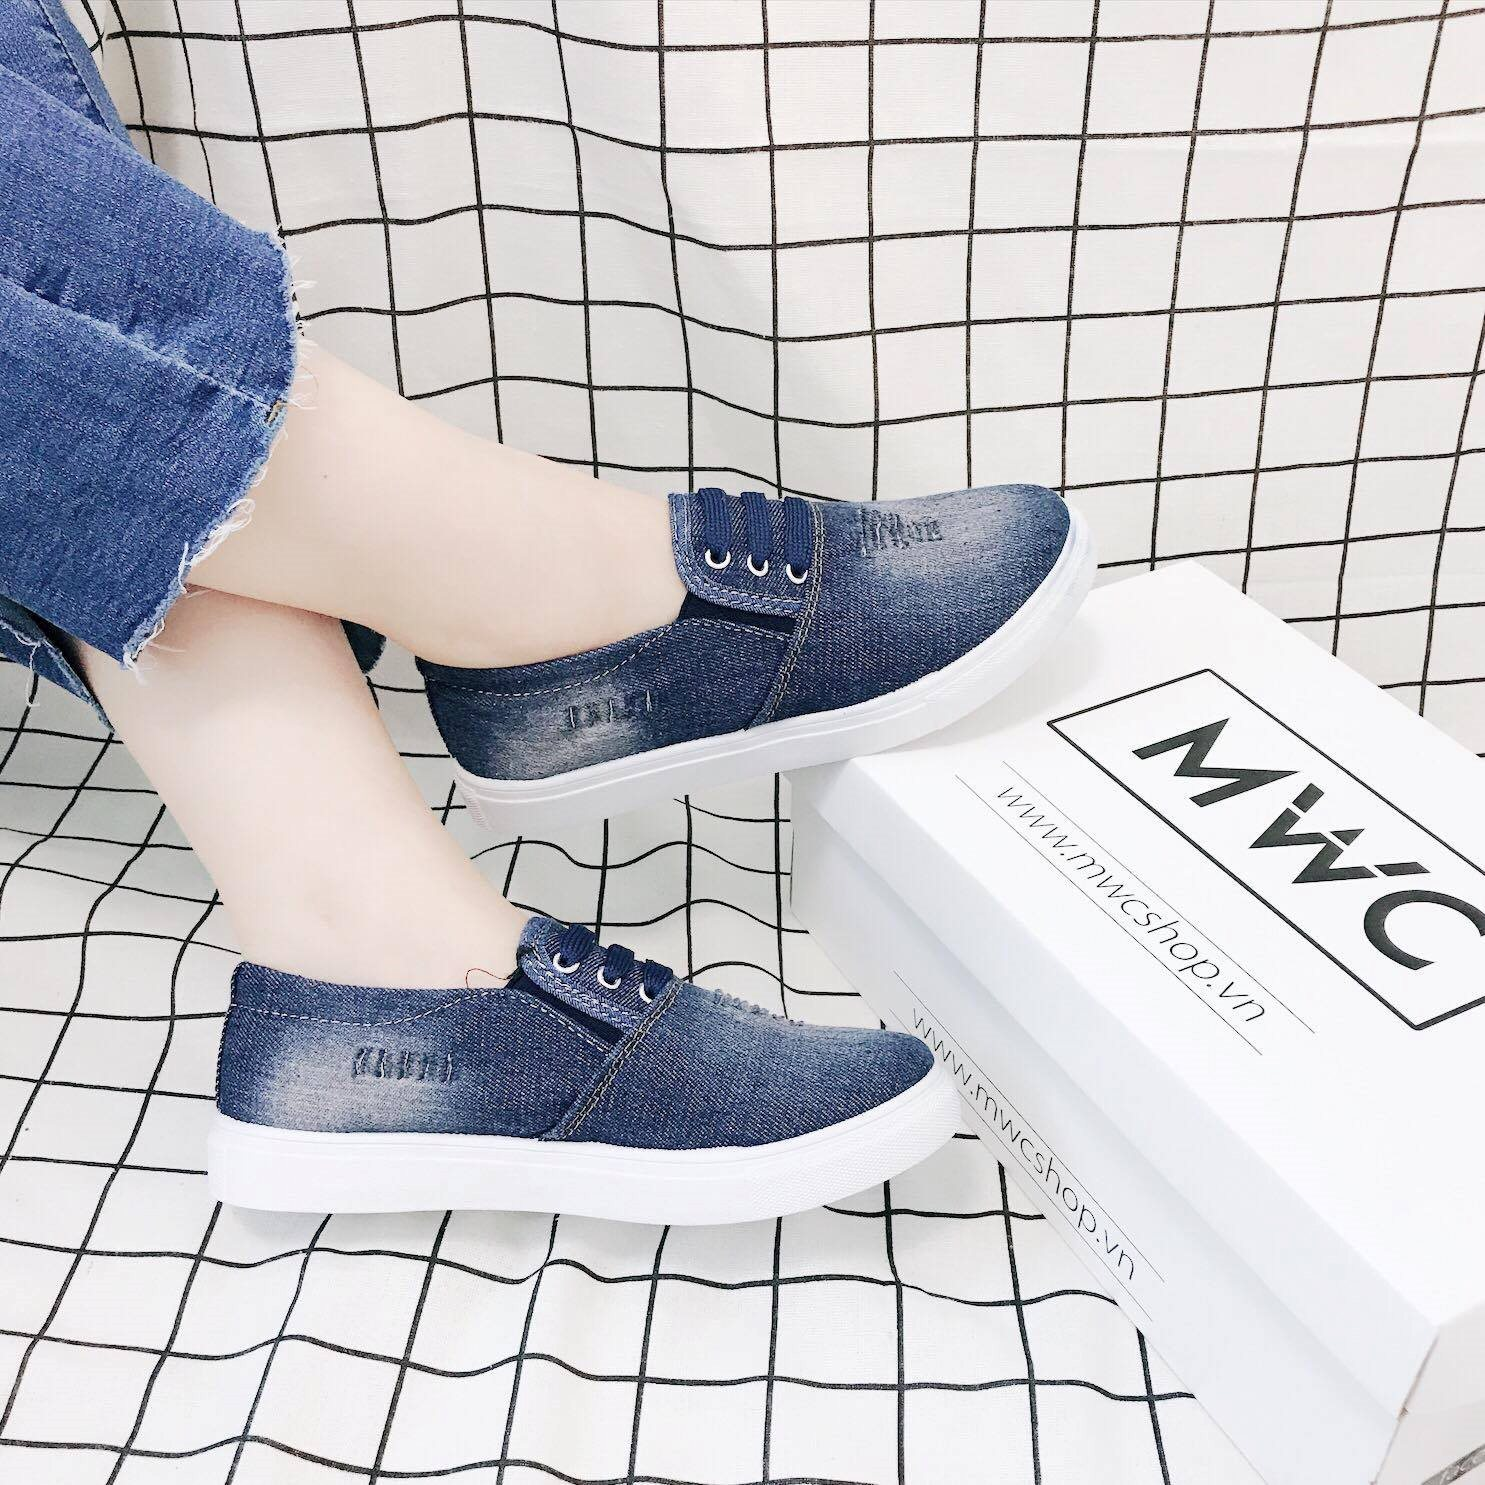 Giày Slipon nữ MWC NUSL- 1520